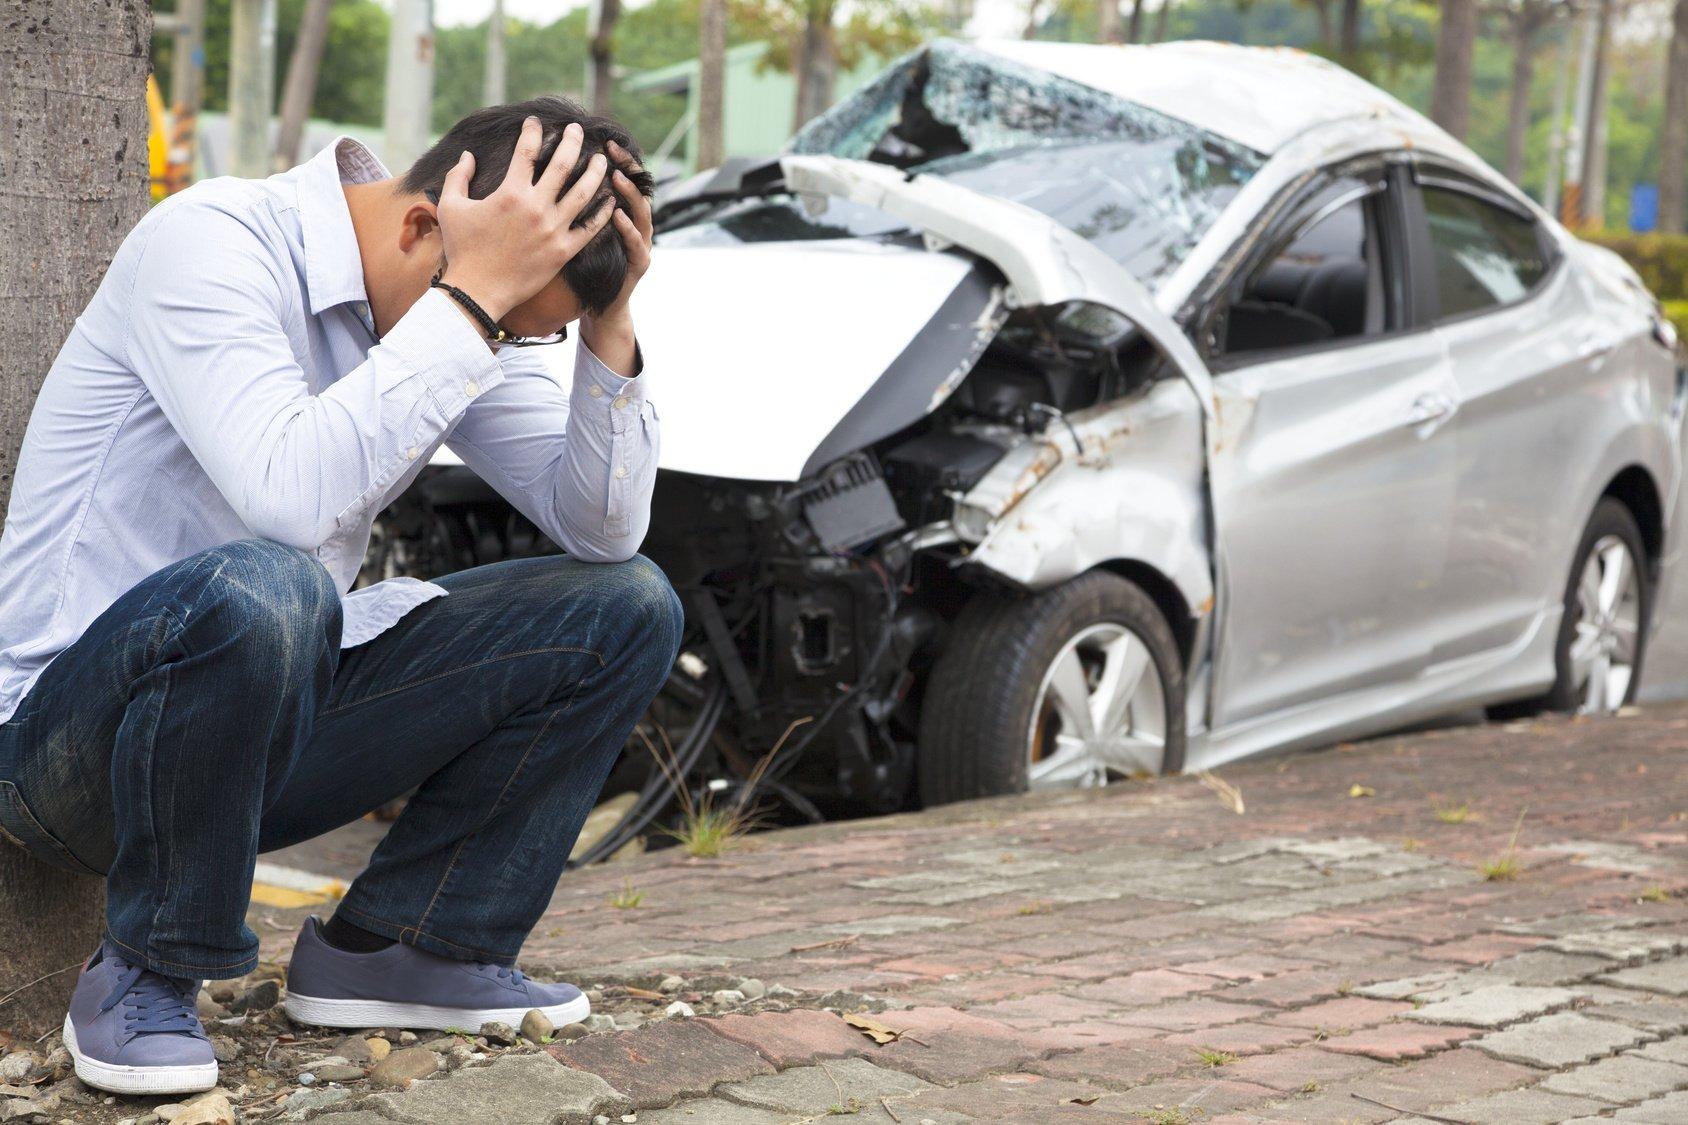 http://shbabbek.com/upload/مصرع وإصابة 302 مواطن في 59 حادث مروري أول أيام رمضان